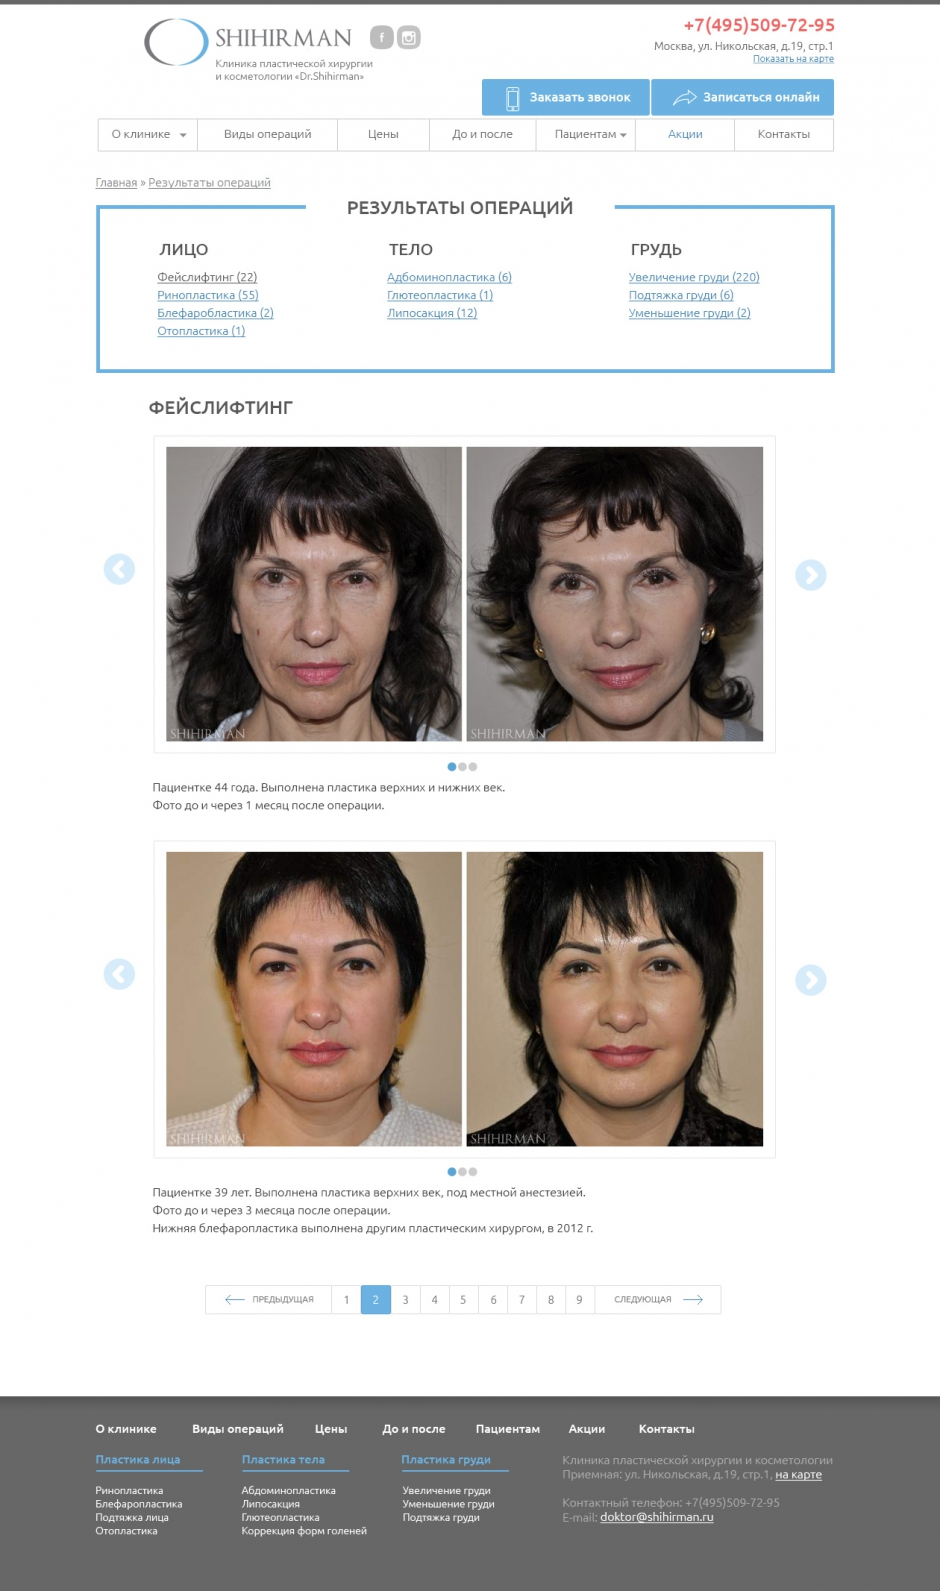 Клиника пластической хирургии и косметологии Dr. Shihirman